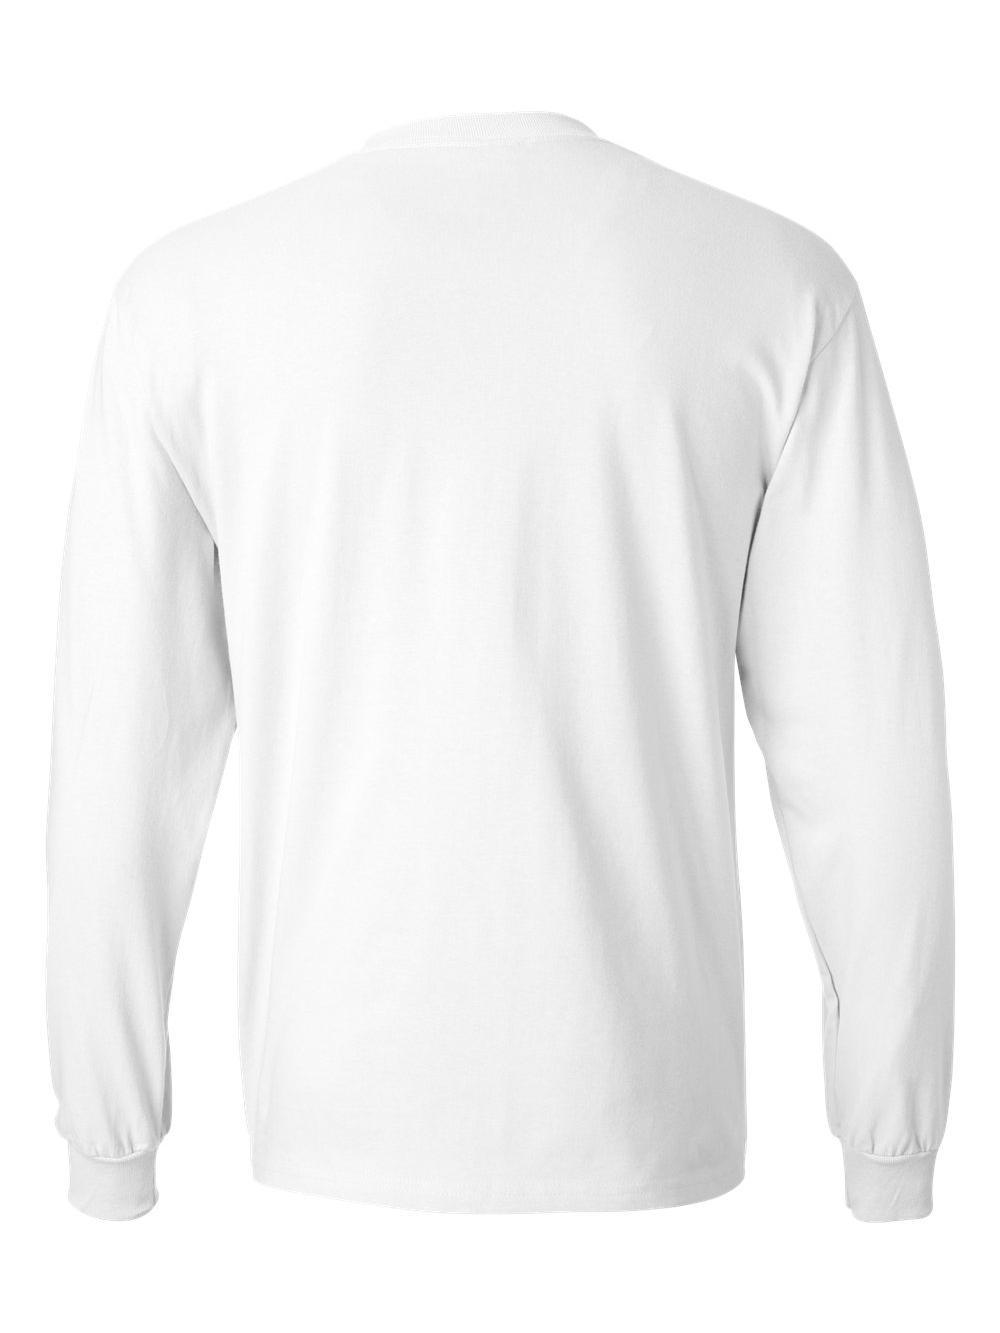 Hanes-Beefy-T-Long-Sleeve-T-Shirt-5186 thumbnail 55